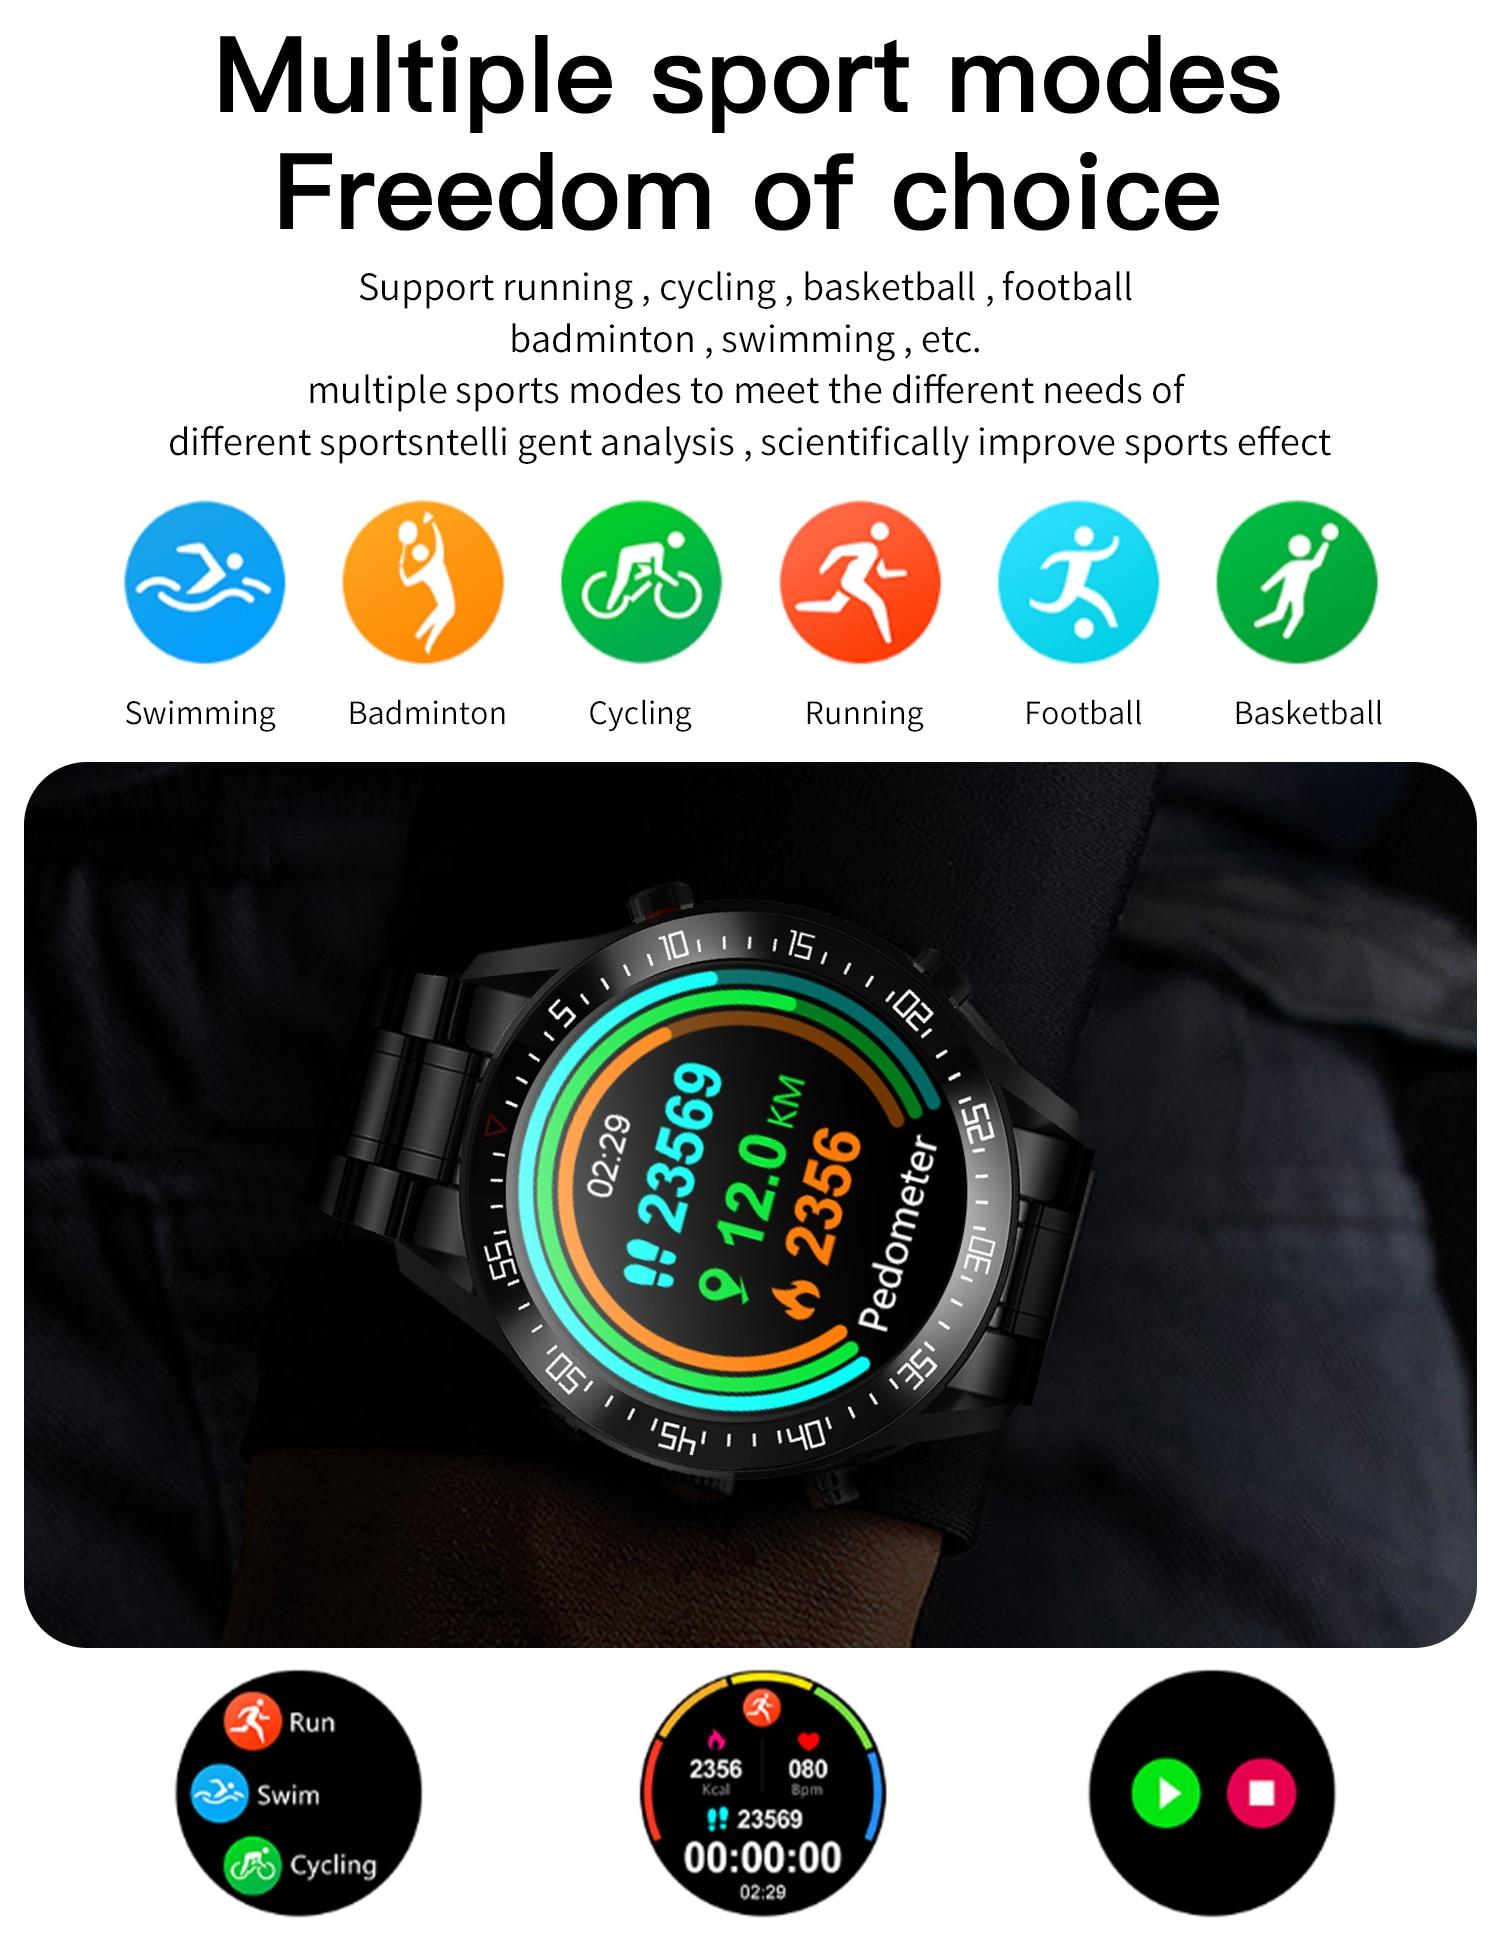 H027976920b584556a536136e0e19508a0 XUESEVEN 2021 HD Full circle touch screen Mens Smart Watches IP68 Waterproof Sports Fitness Watch Fashion Smart Watch for men